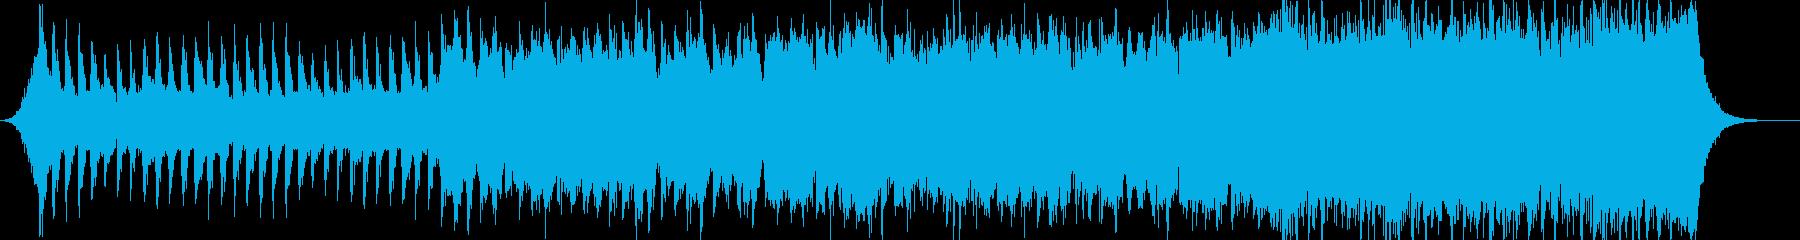 Hollywood Orchestra 4の再生済みの波形